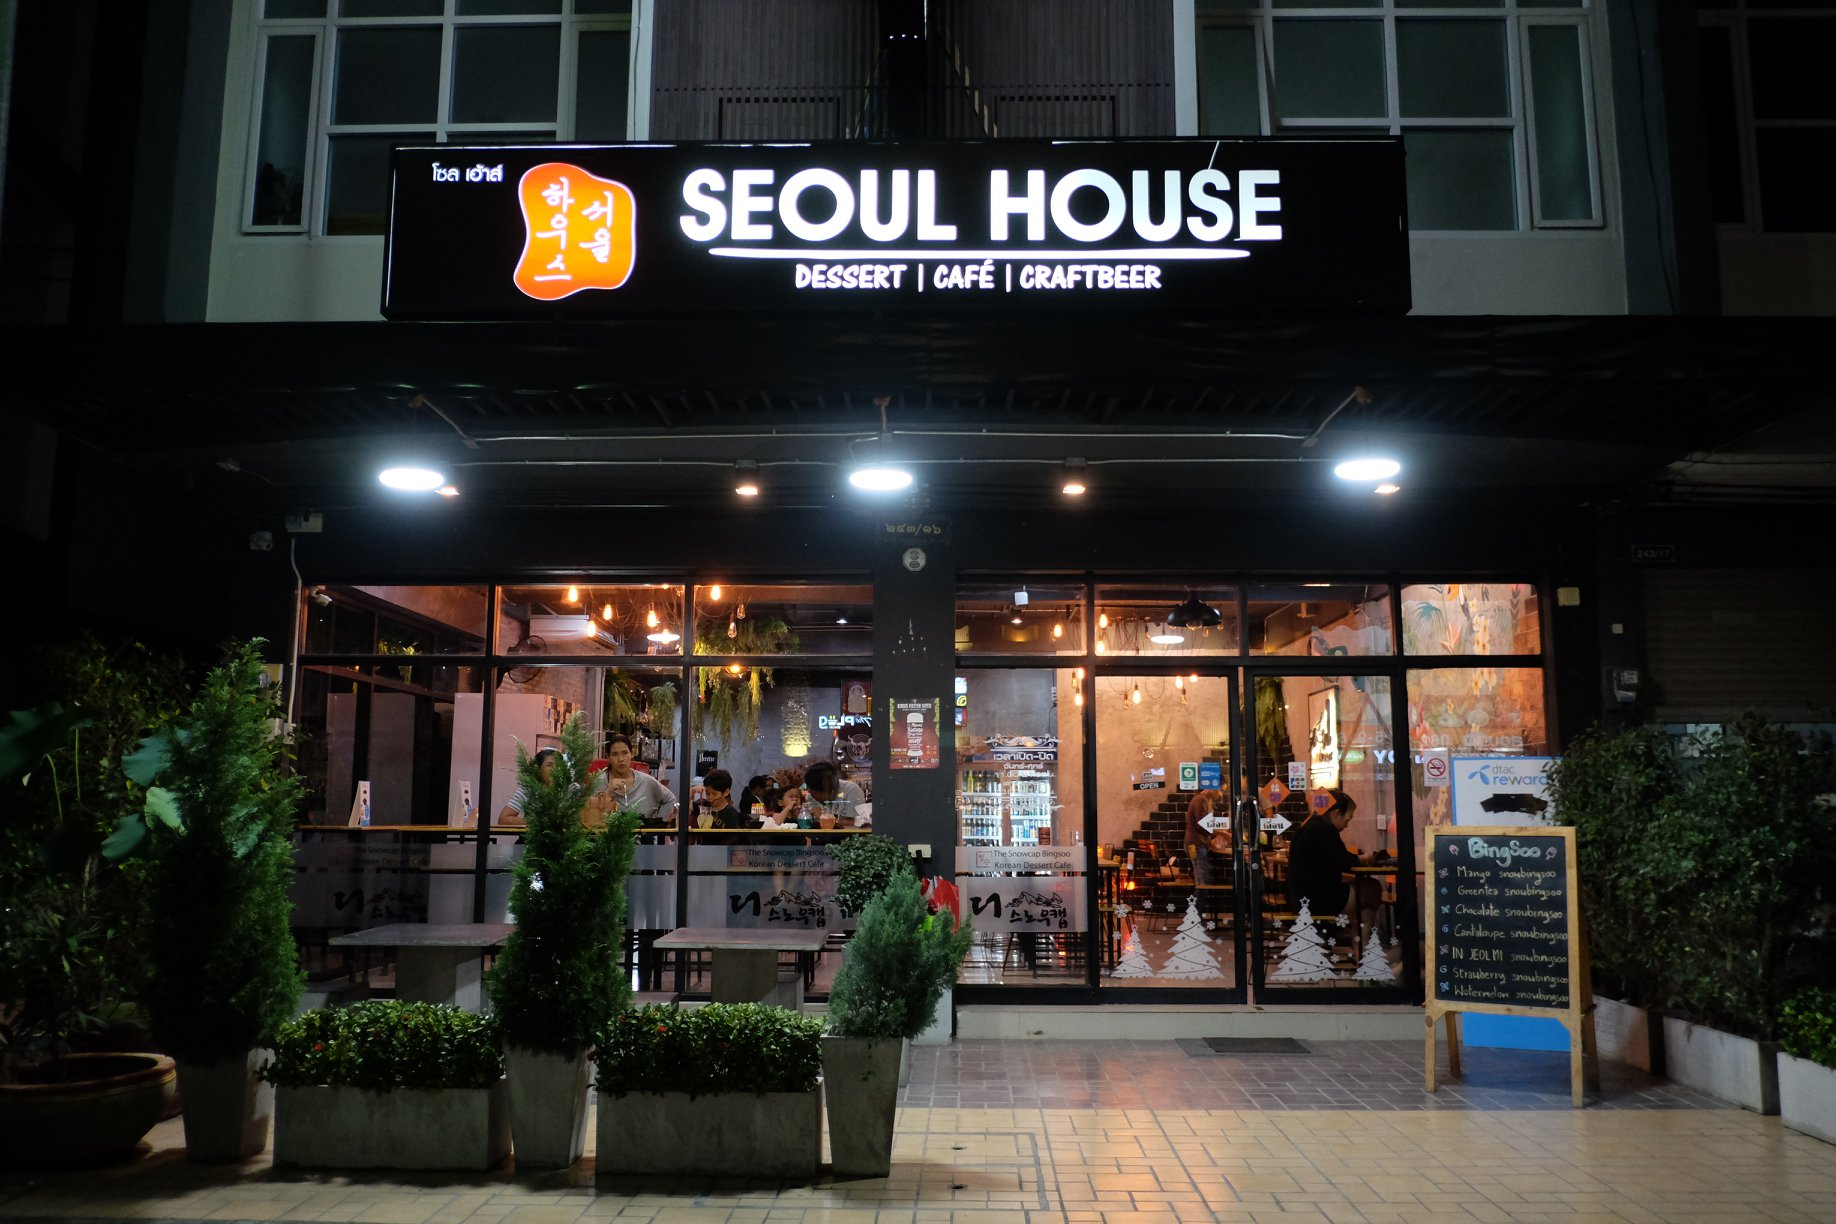 10.-Seoul-House:-dessert-cafe?-craftbeer-นครศรีฯ-ร้านนี้ก็เปิดจนถึง-3-ทุ่มเช่นกันครับ-รีวิวตัวเต็ม-คลิกที่นี่  แหล่งท่องเที่ยว,นครศรี,จุดเช็คอิน,จุดถ่ายรูป,คาเฟ่,ของกิน,จุดกิน